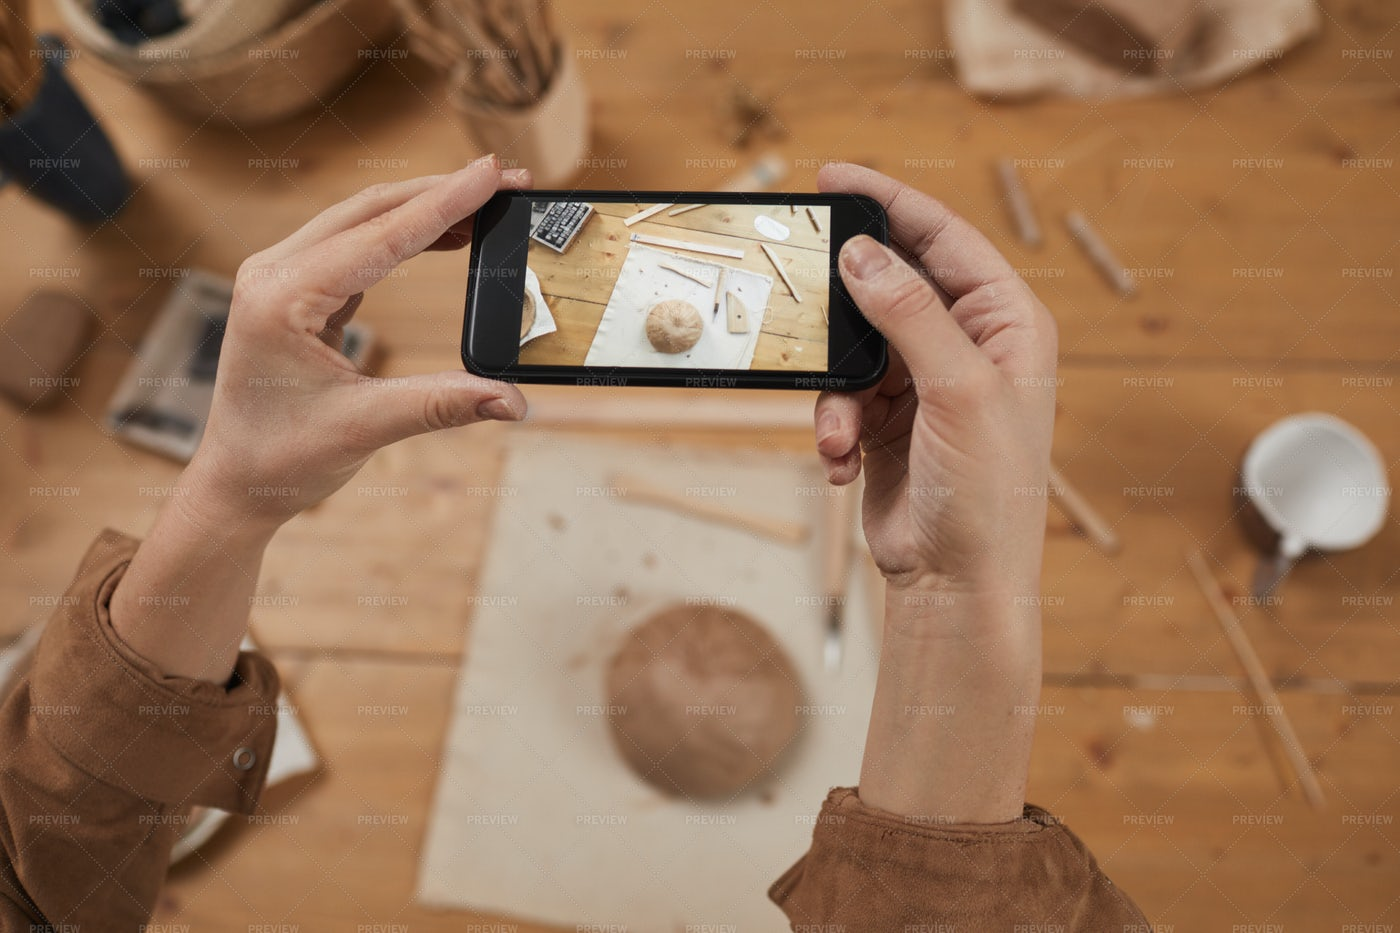 Taking Photo Of Ceramic Bowl: Stock Photos